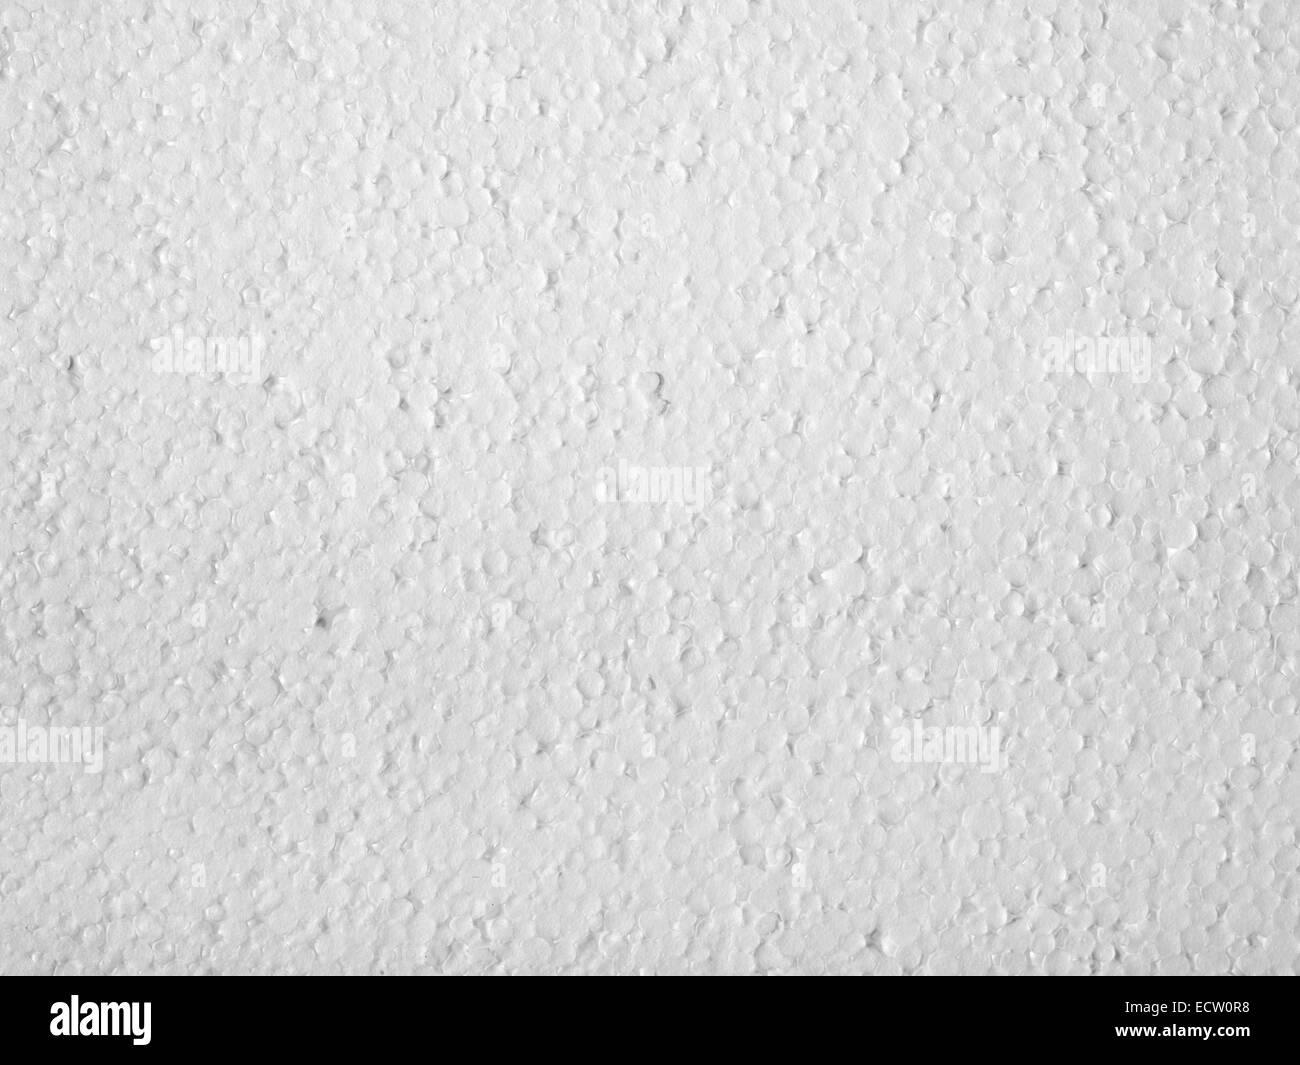 Gros plan plein cadre d'une surface en polystyrène blanc Photo Stock